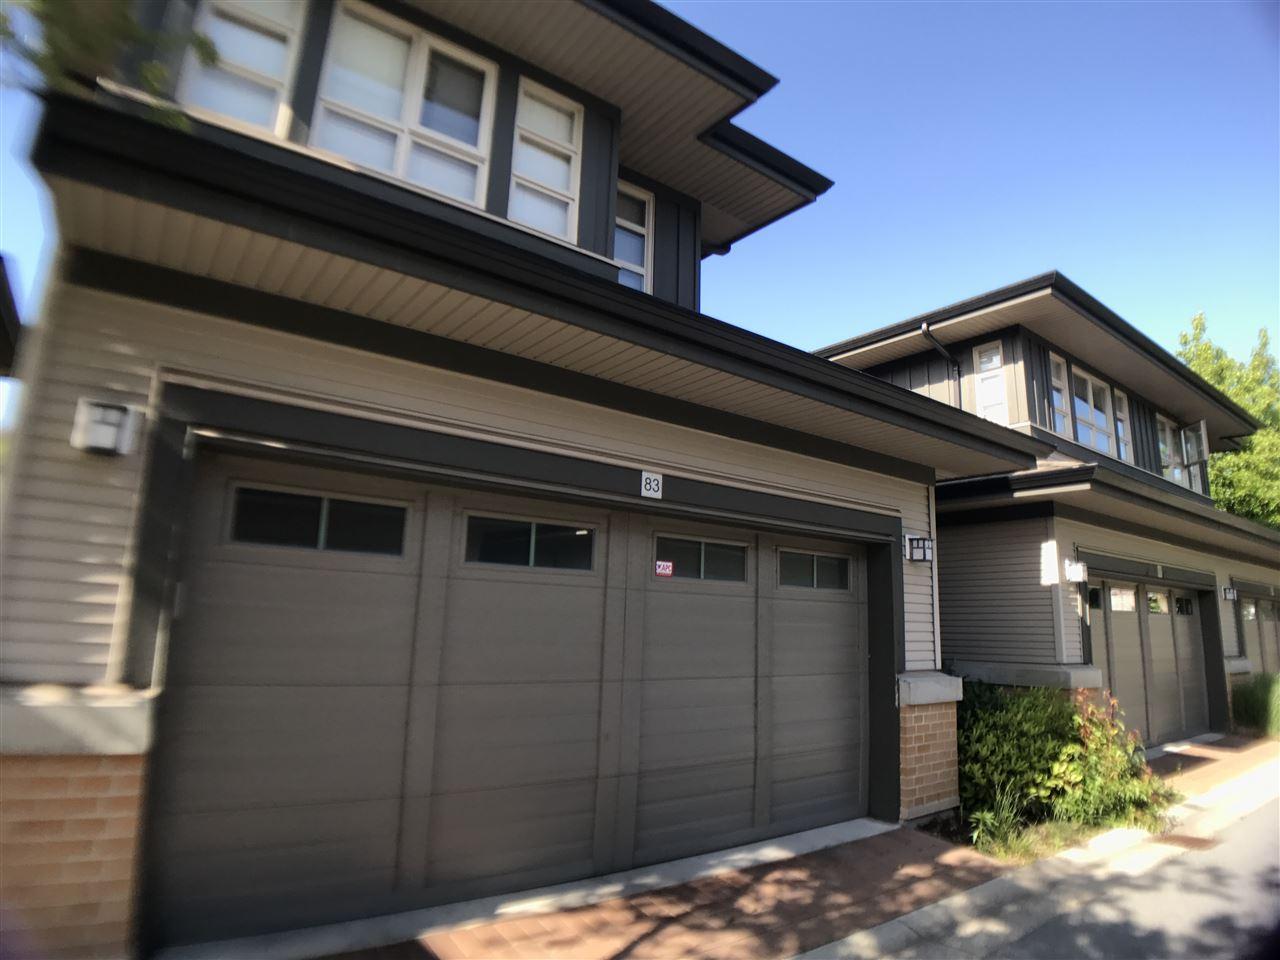 Townhouse at 83 6300 BIRCH STREET, Unit 83, Richmond, British Columbia. Image 1